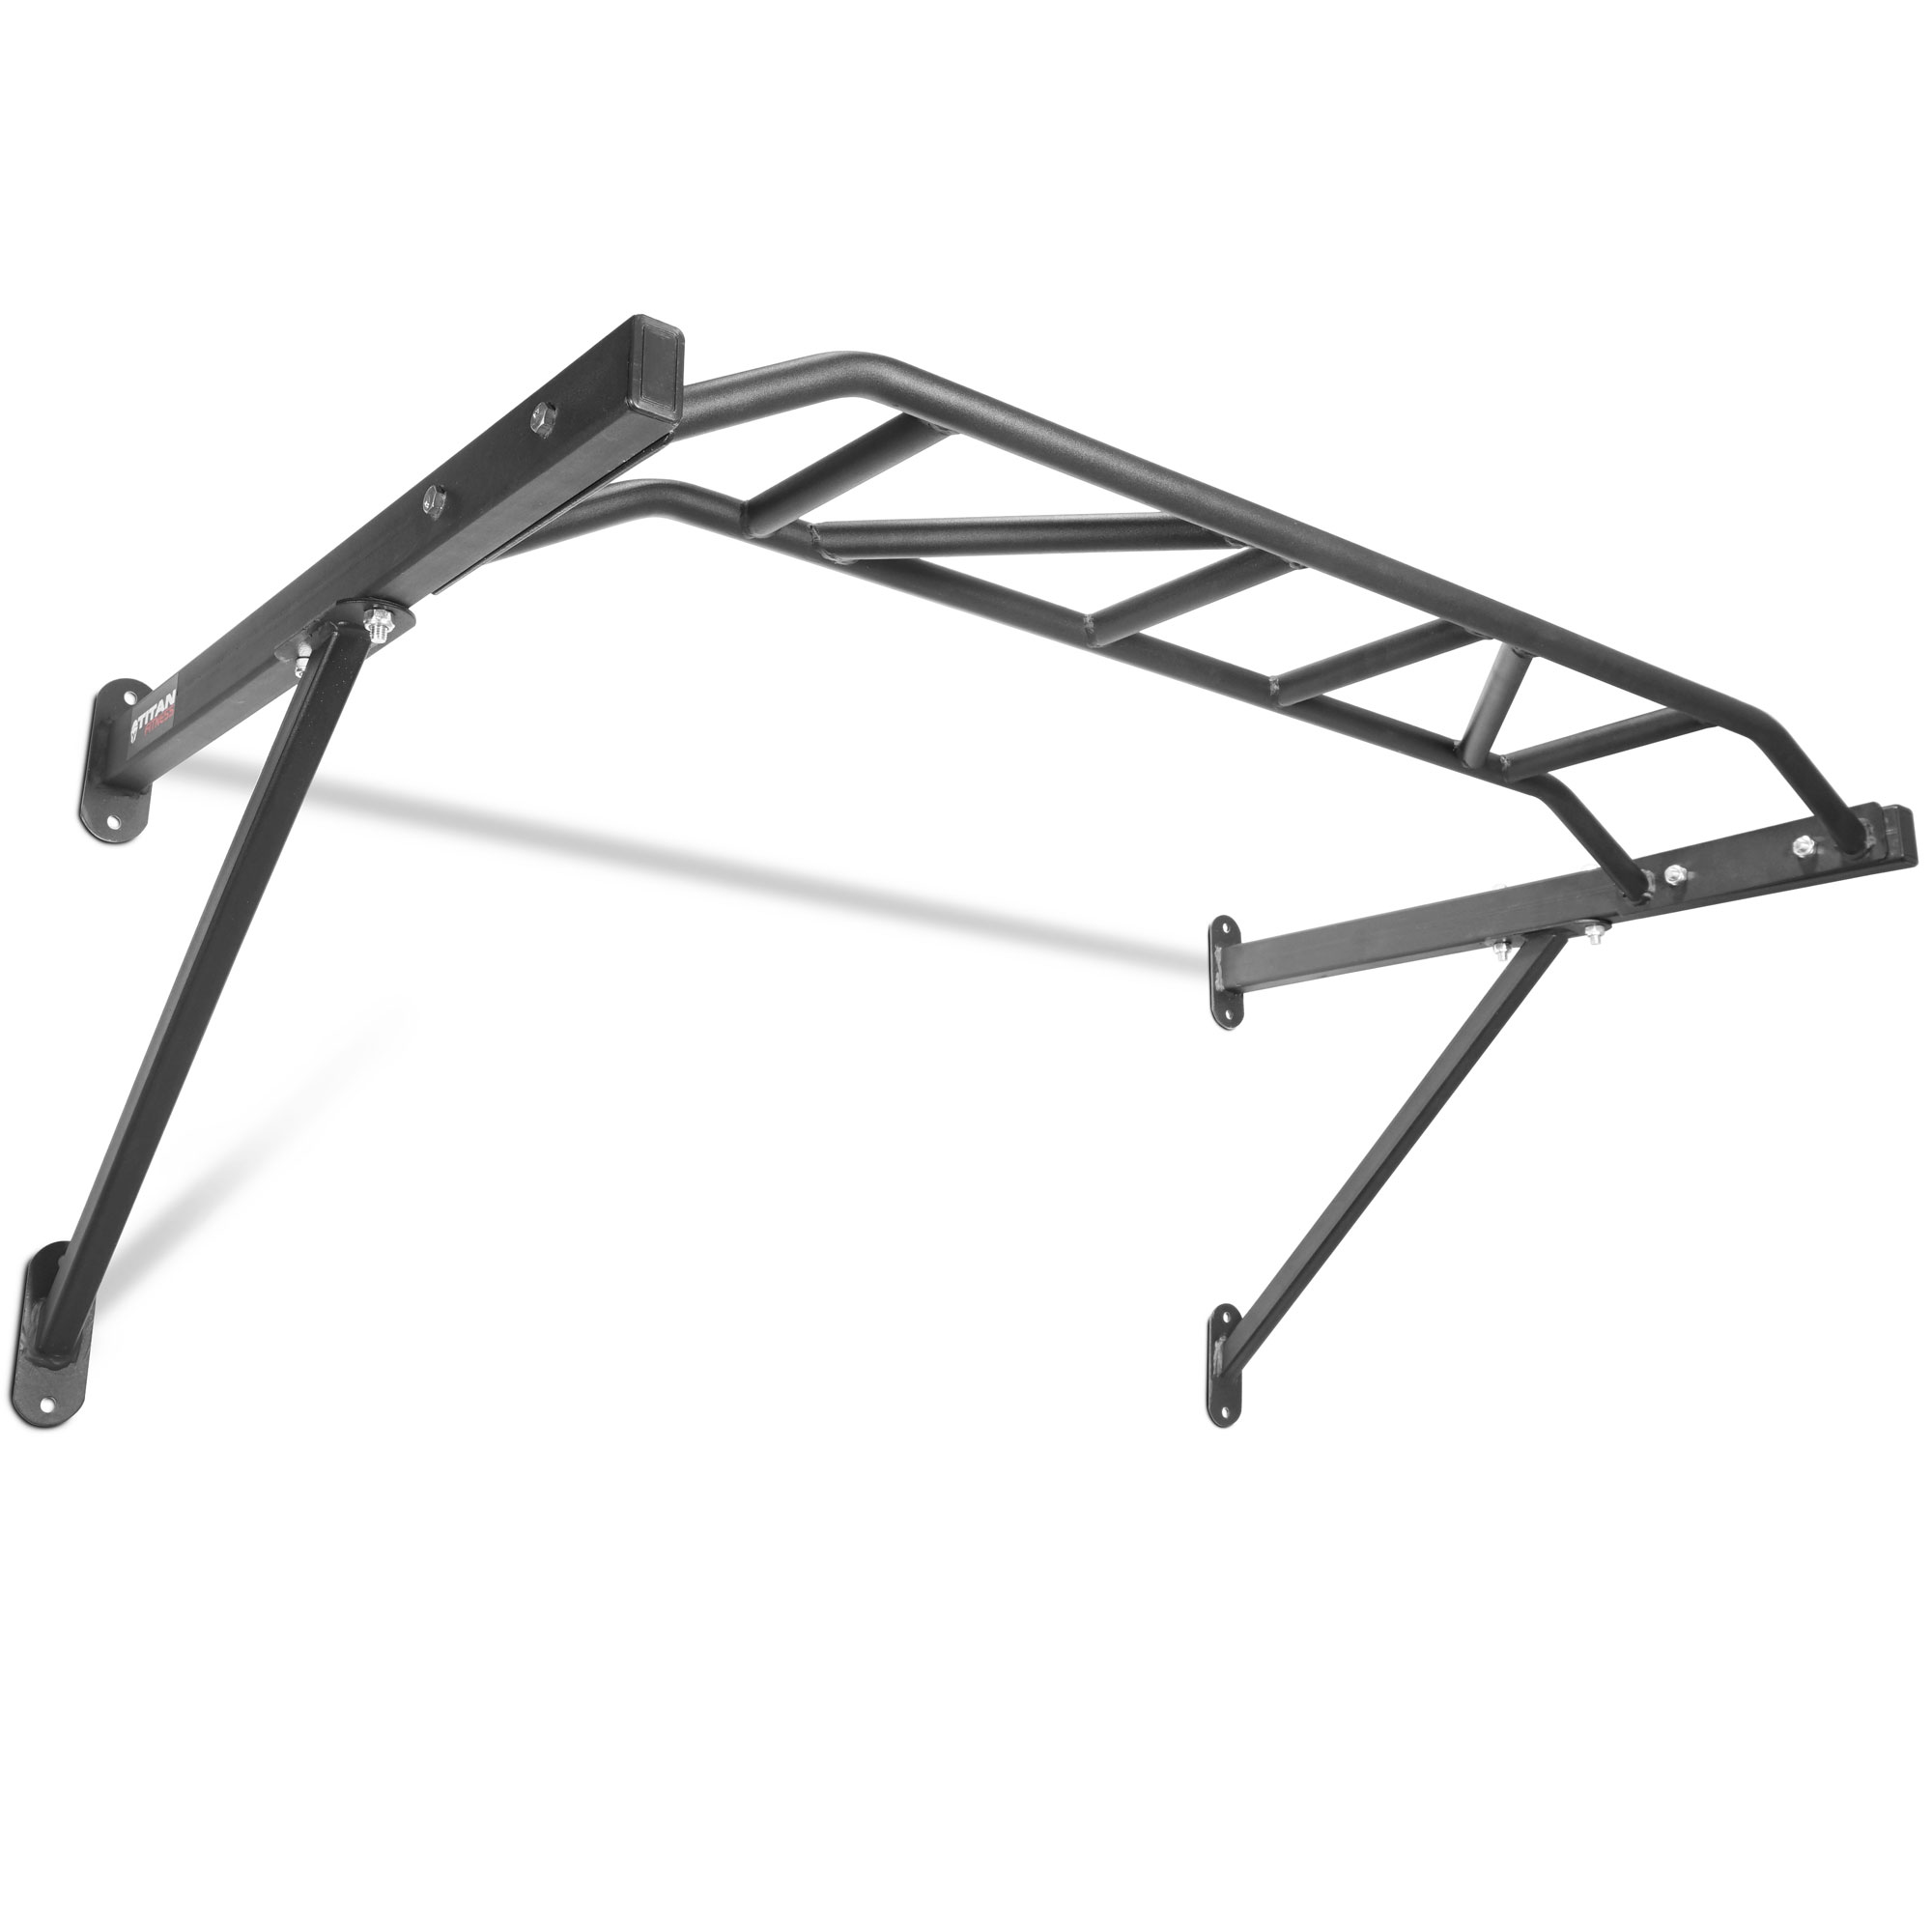 "Titan Fitness HD Multi Grip Wall Mounted Pull Up Bar, Steel, 48""W Grip"